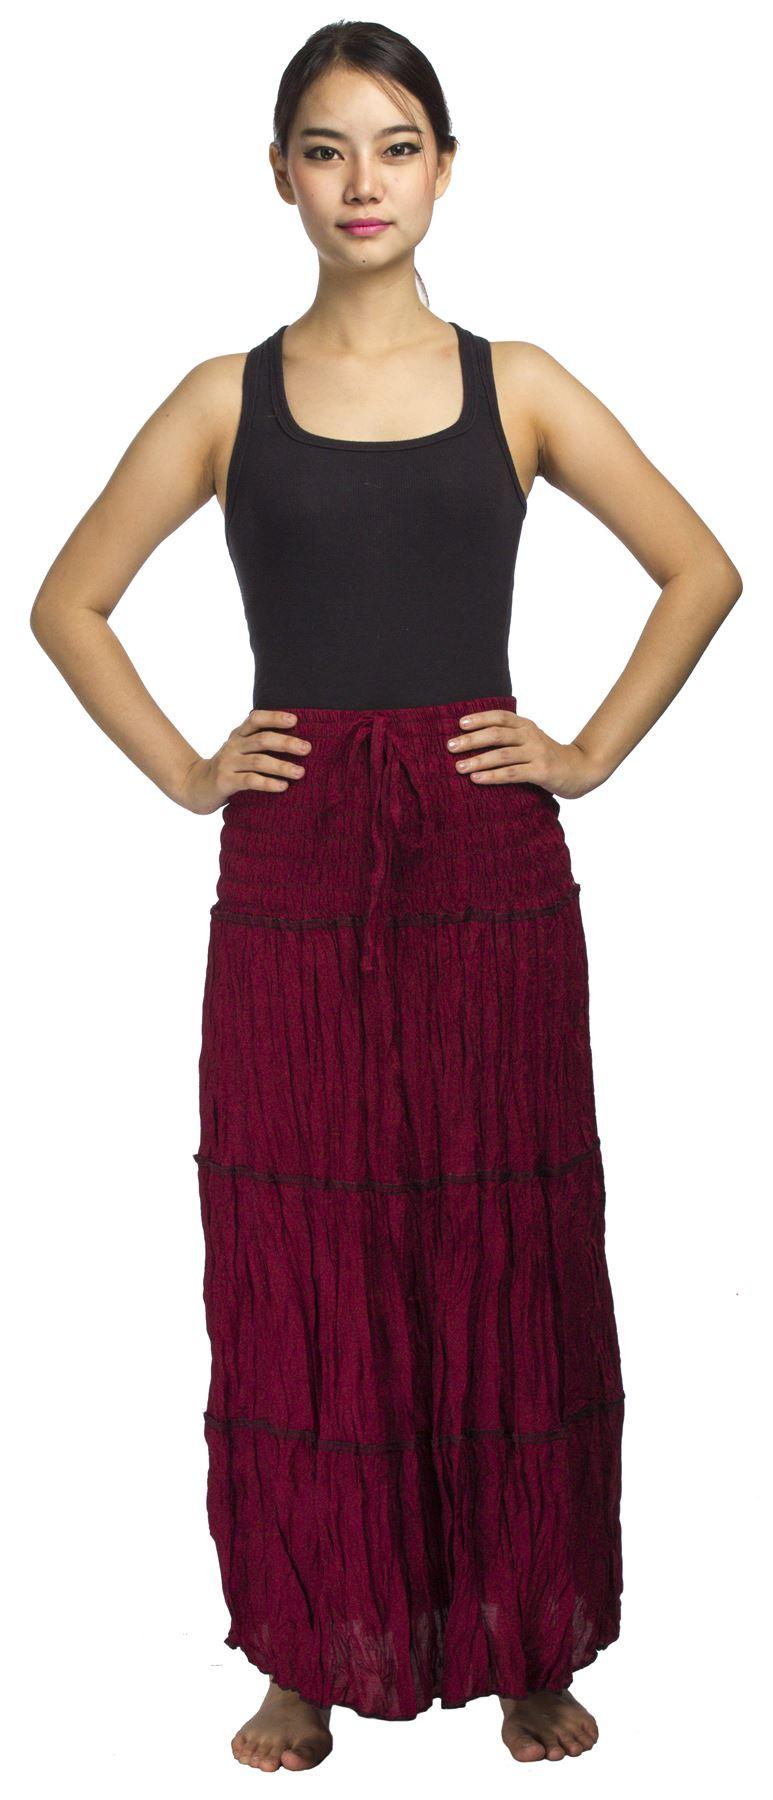 Neu damen lang gesmokt rock kleid gypsy boho sommer ebay for Rockabilly kleid lang